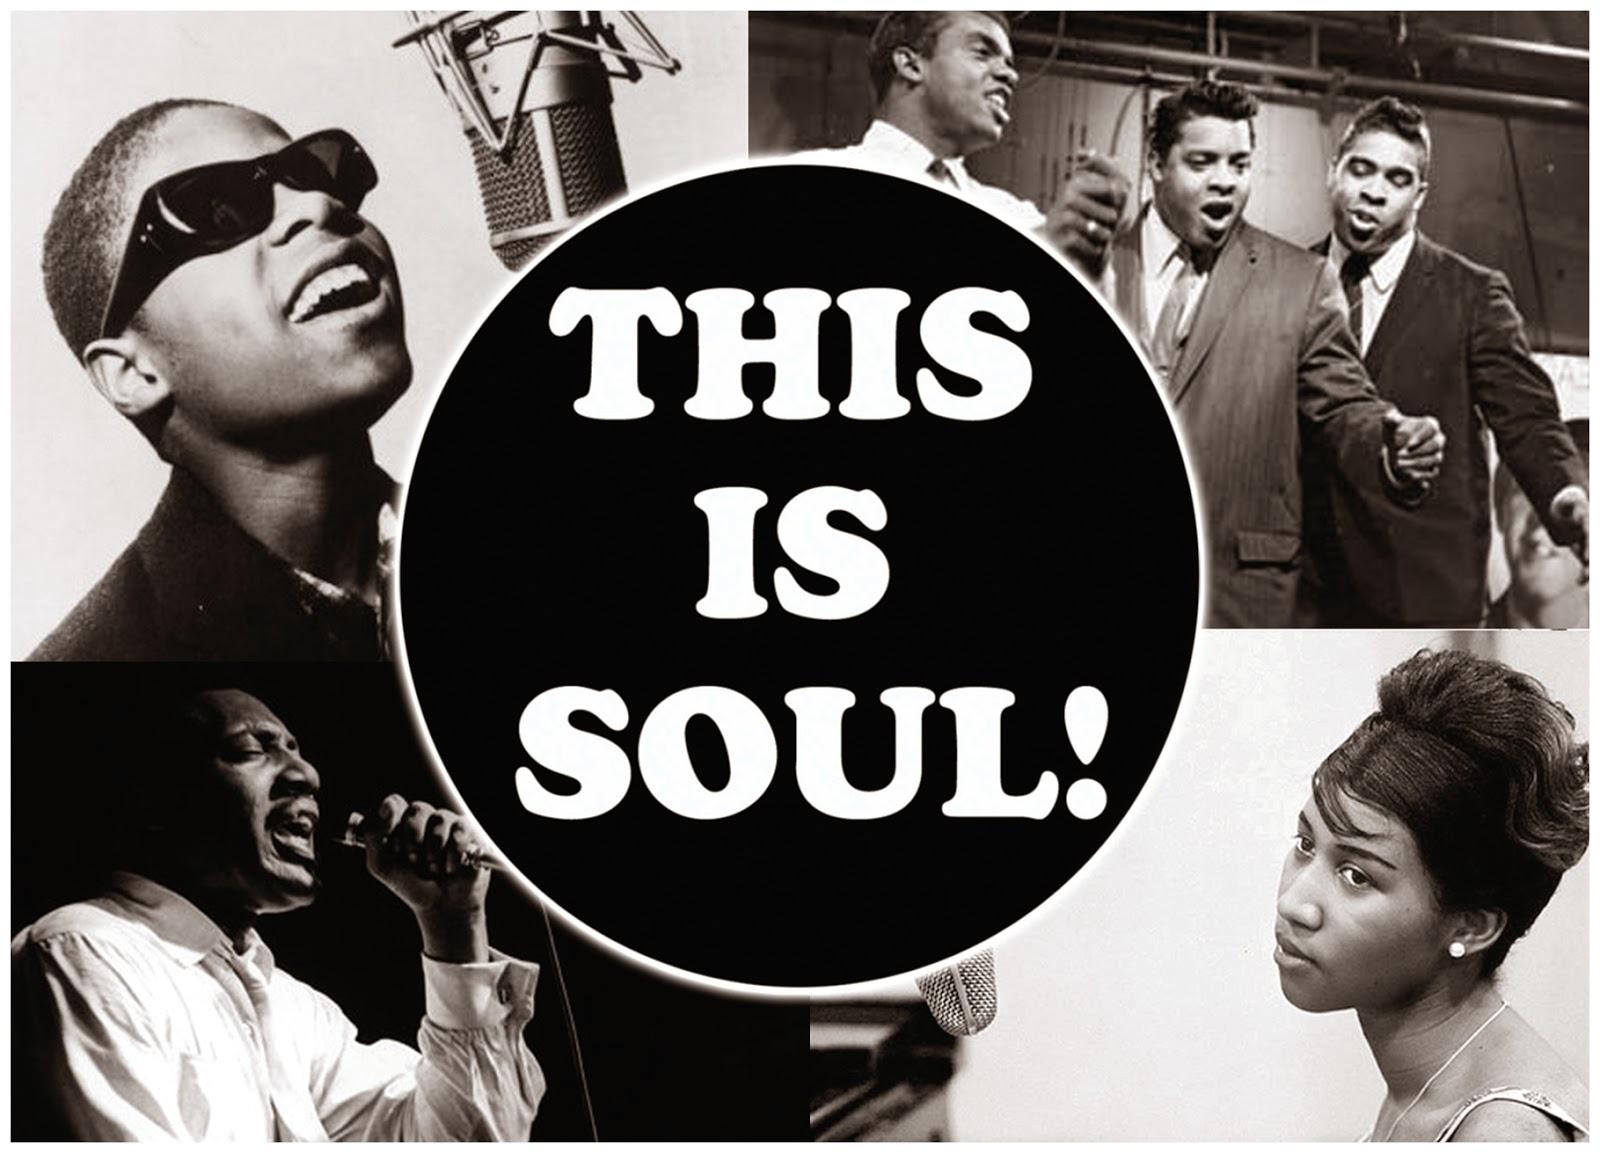 https://ayadeleon.wordpress.com/2013/09/21/60s70s-soul-music-sexism/